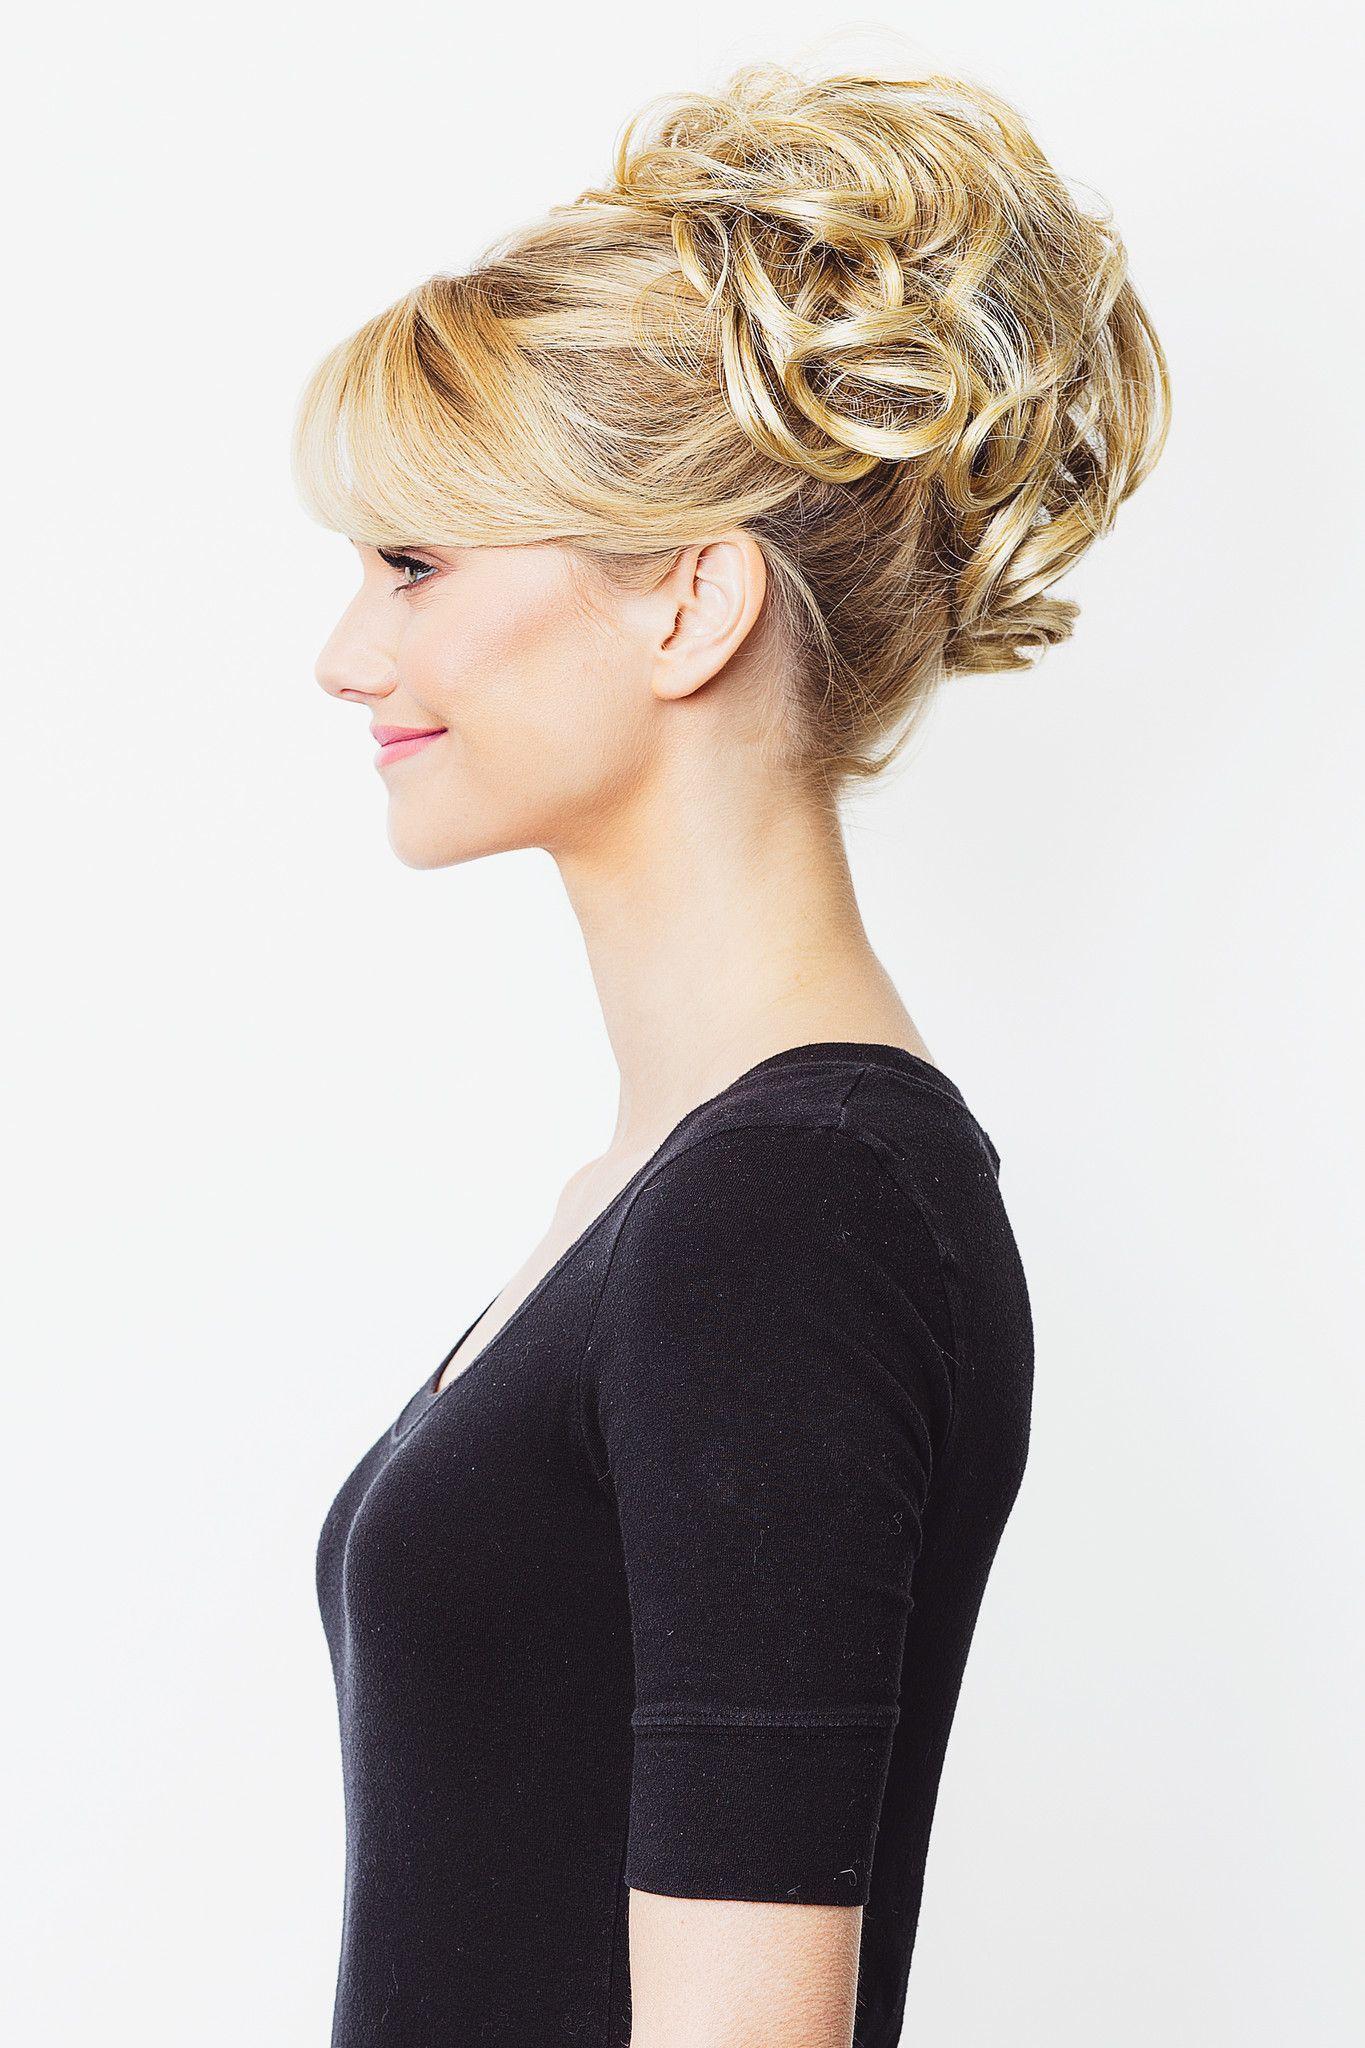 Tiffany Rena Set 140 Value Long Hair Styles Short